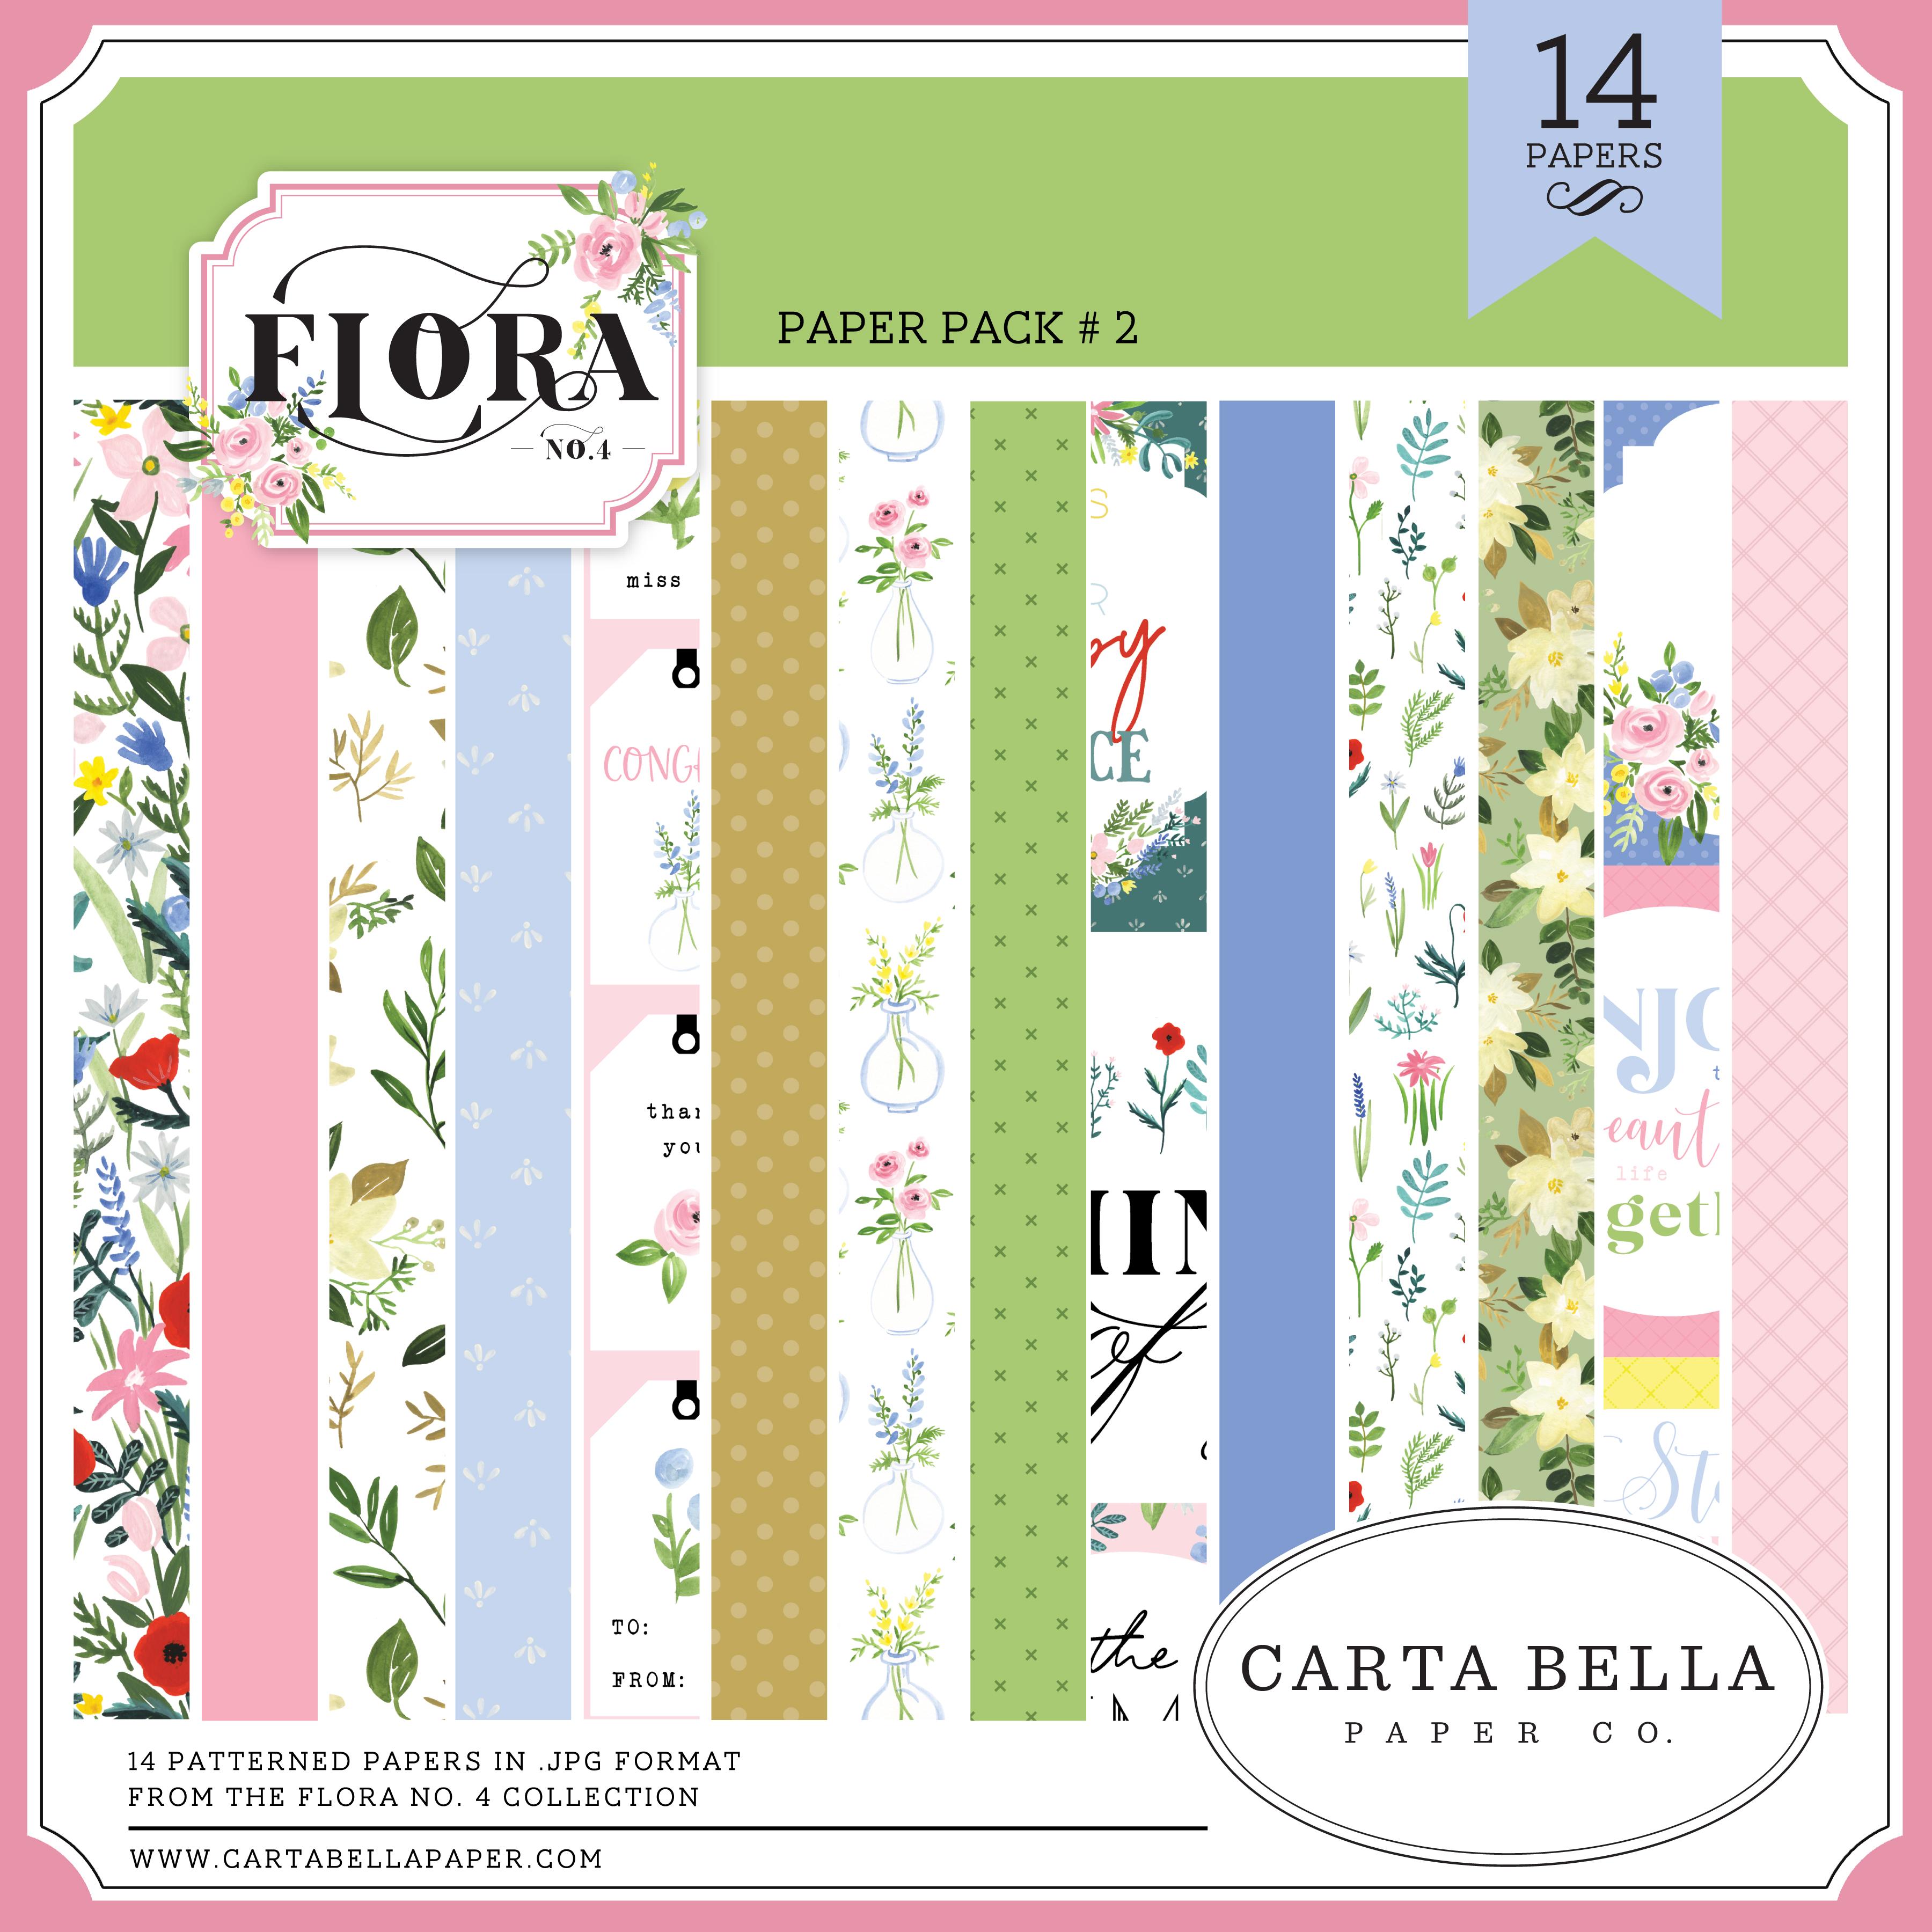 Flora No. 4 Paper Pack #2